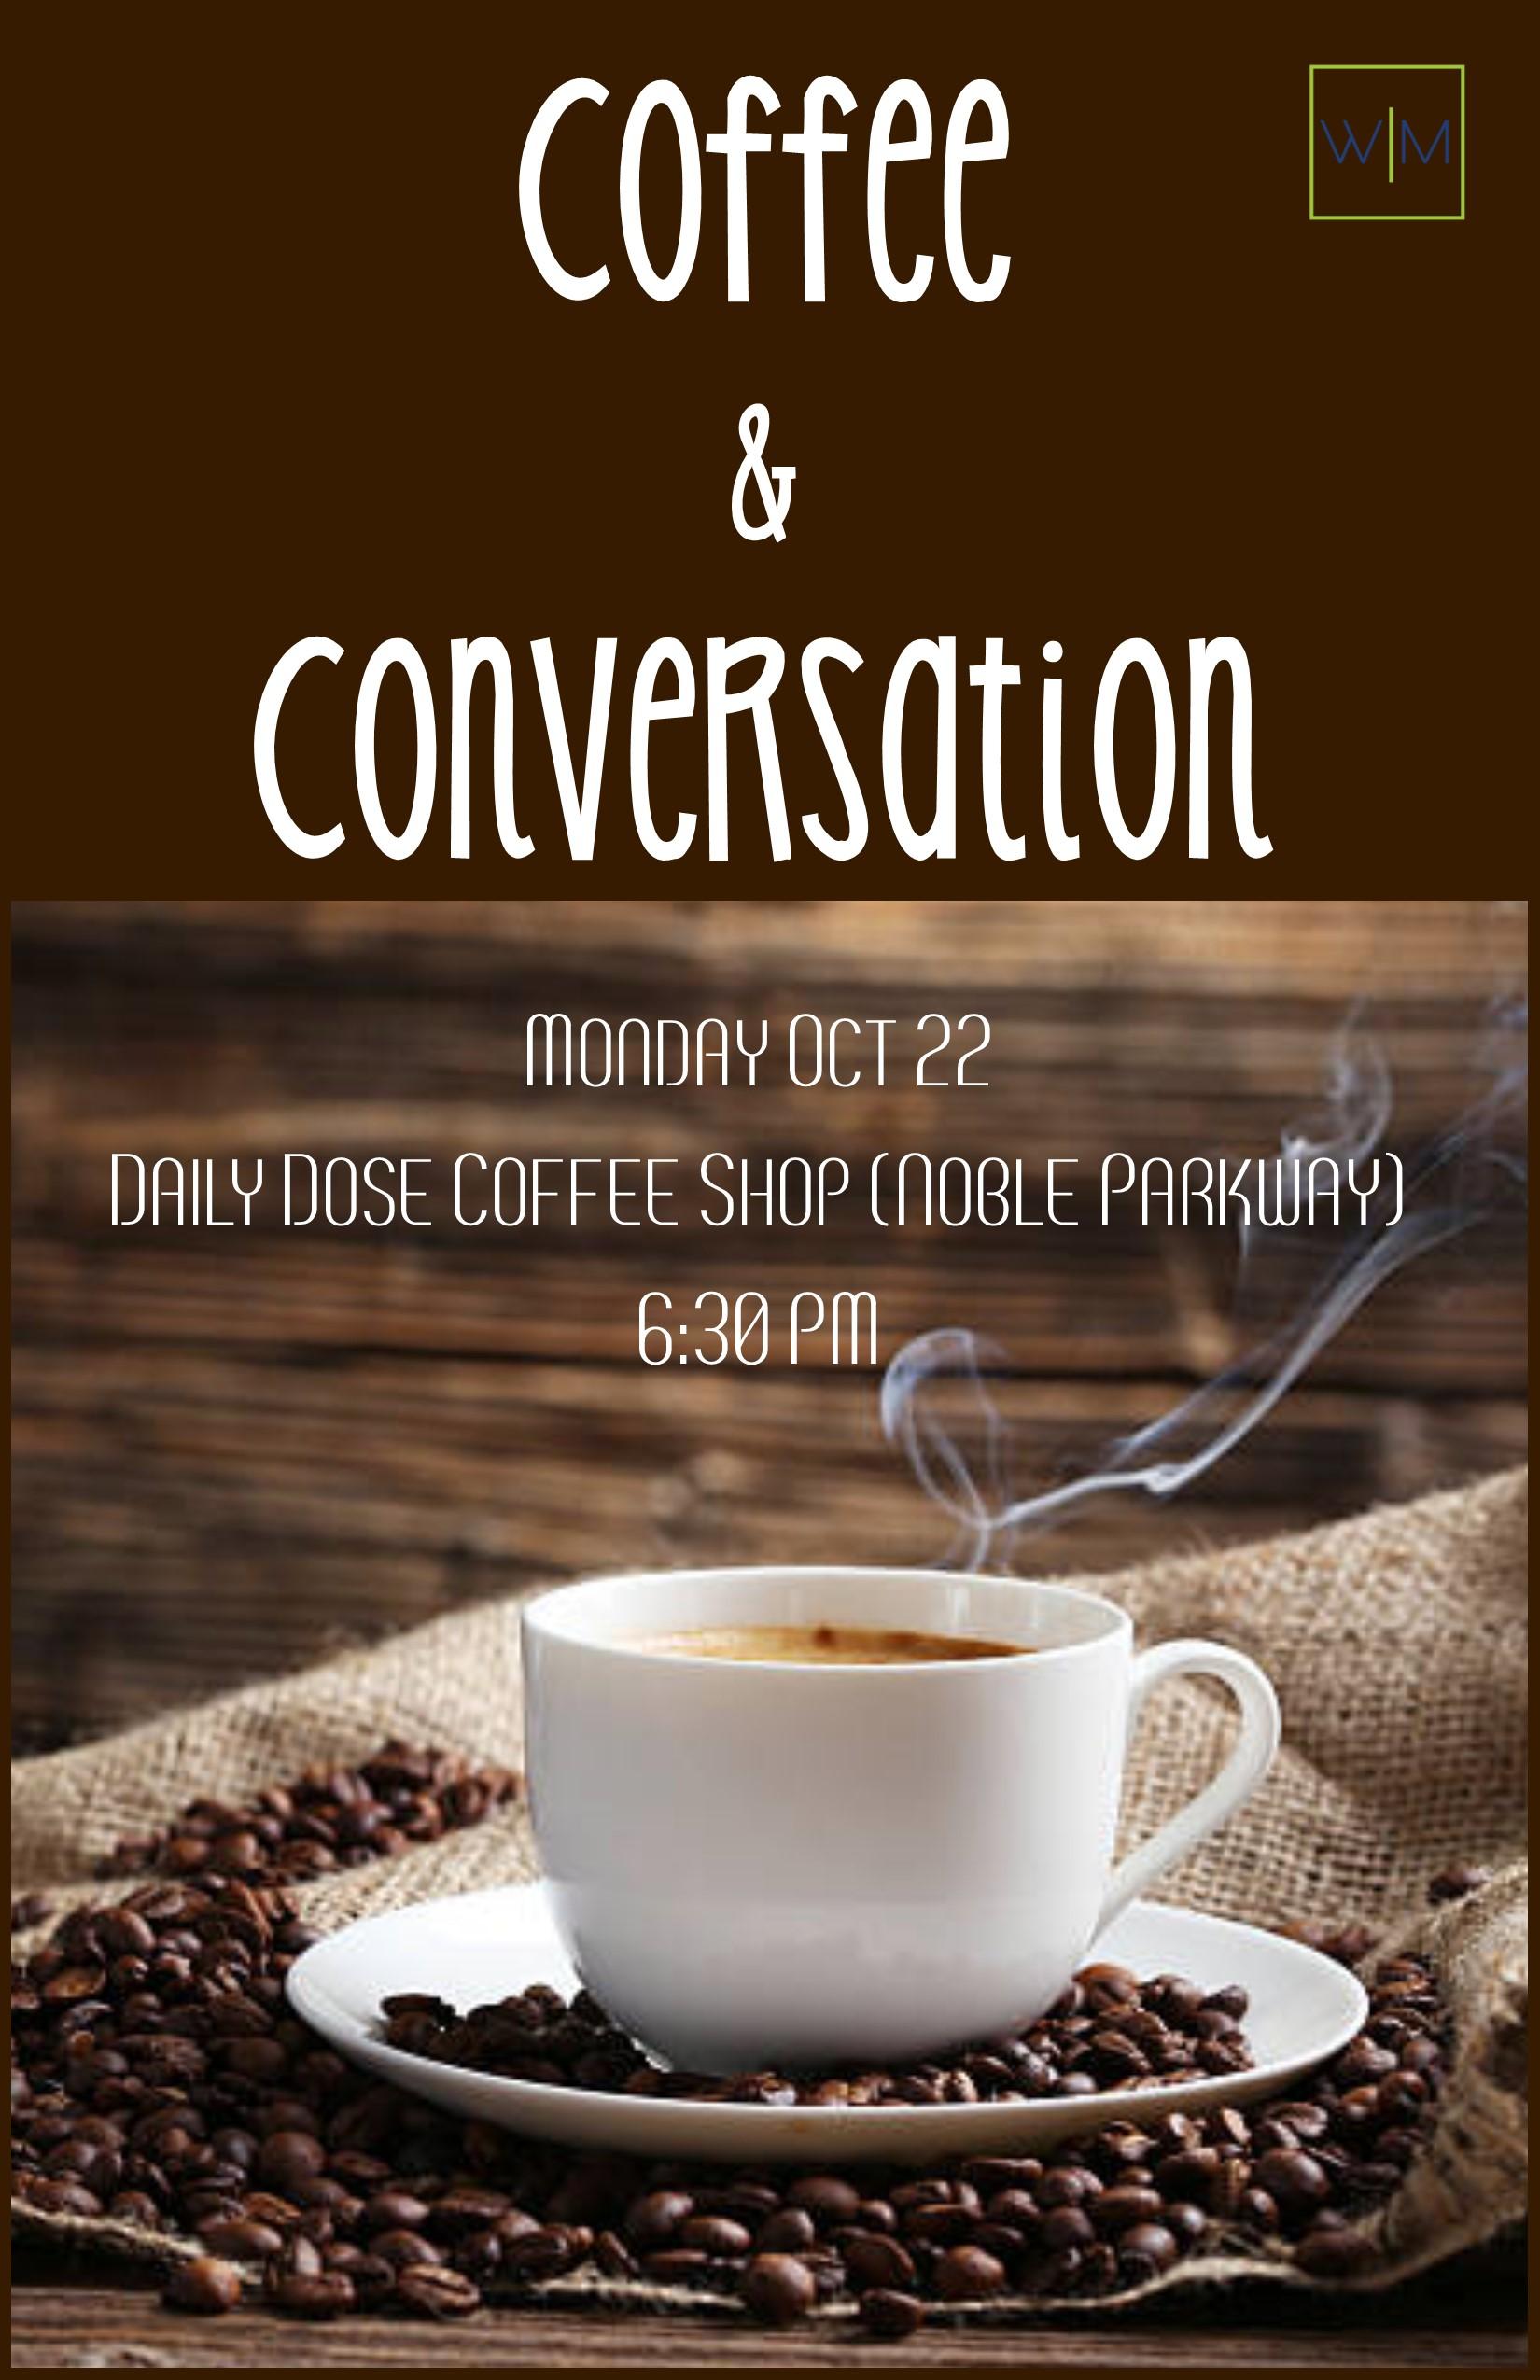 Coffee & Conversation poster.jpg